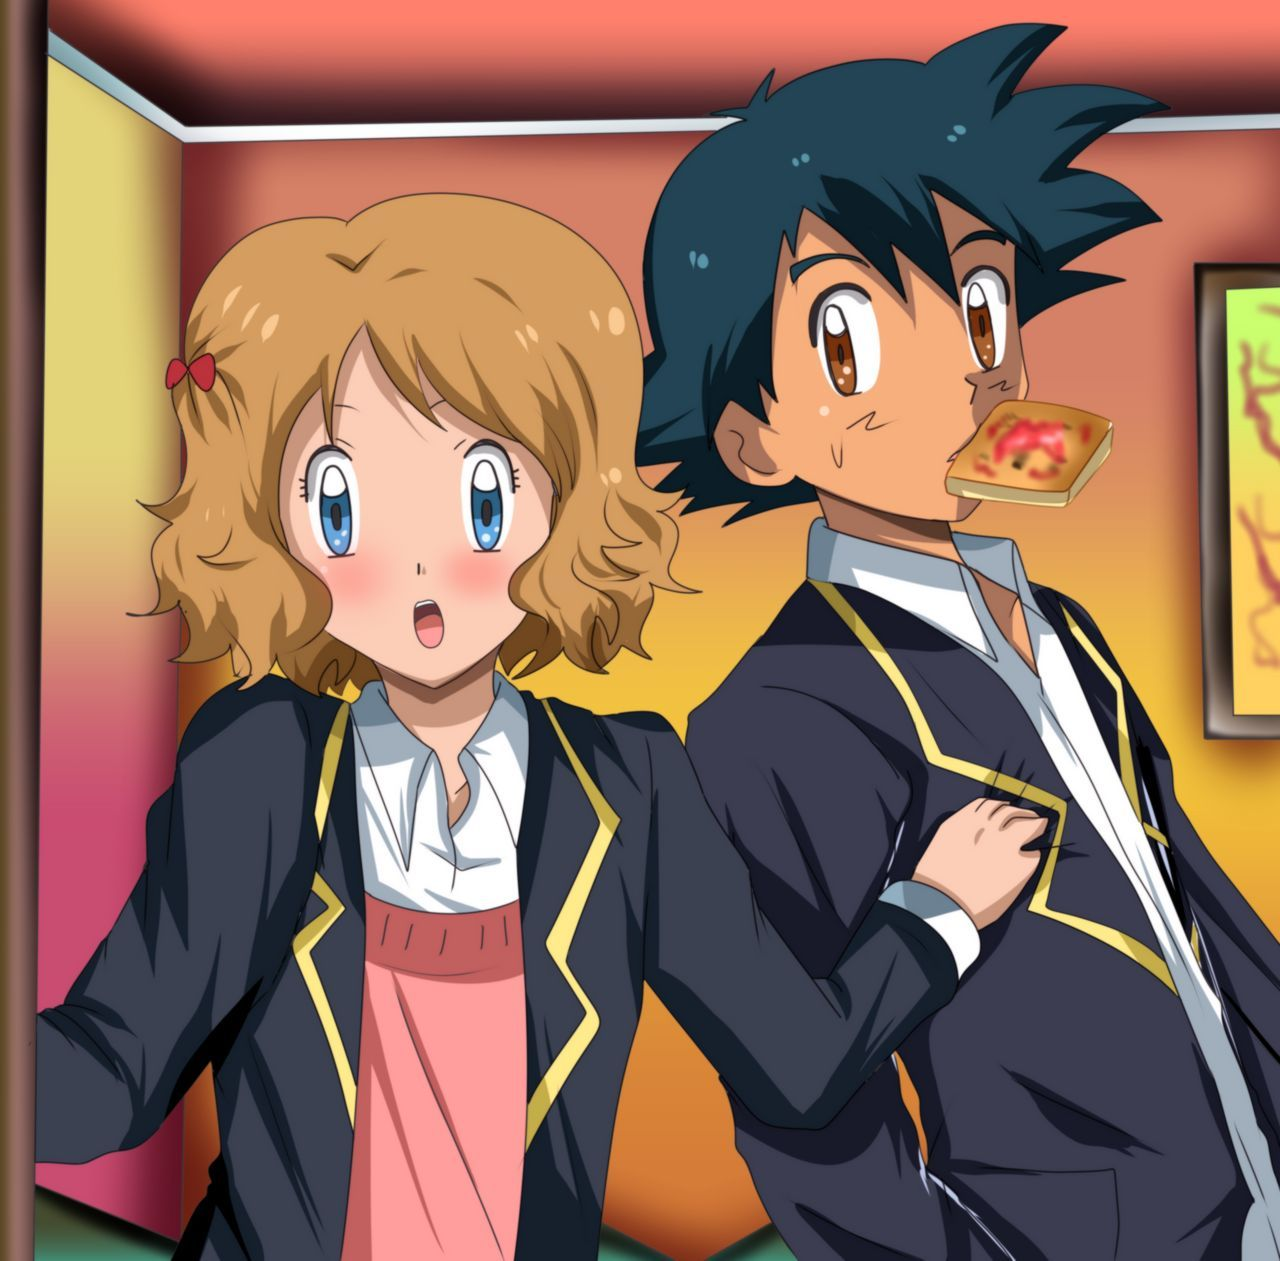 Amourshipping Student By Hikariangelove On Deviantart Pokemon Ash And Serena Pokemon Manga Pokemon Comics